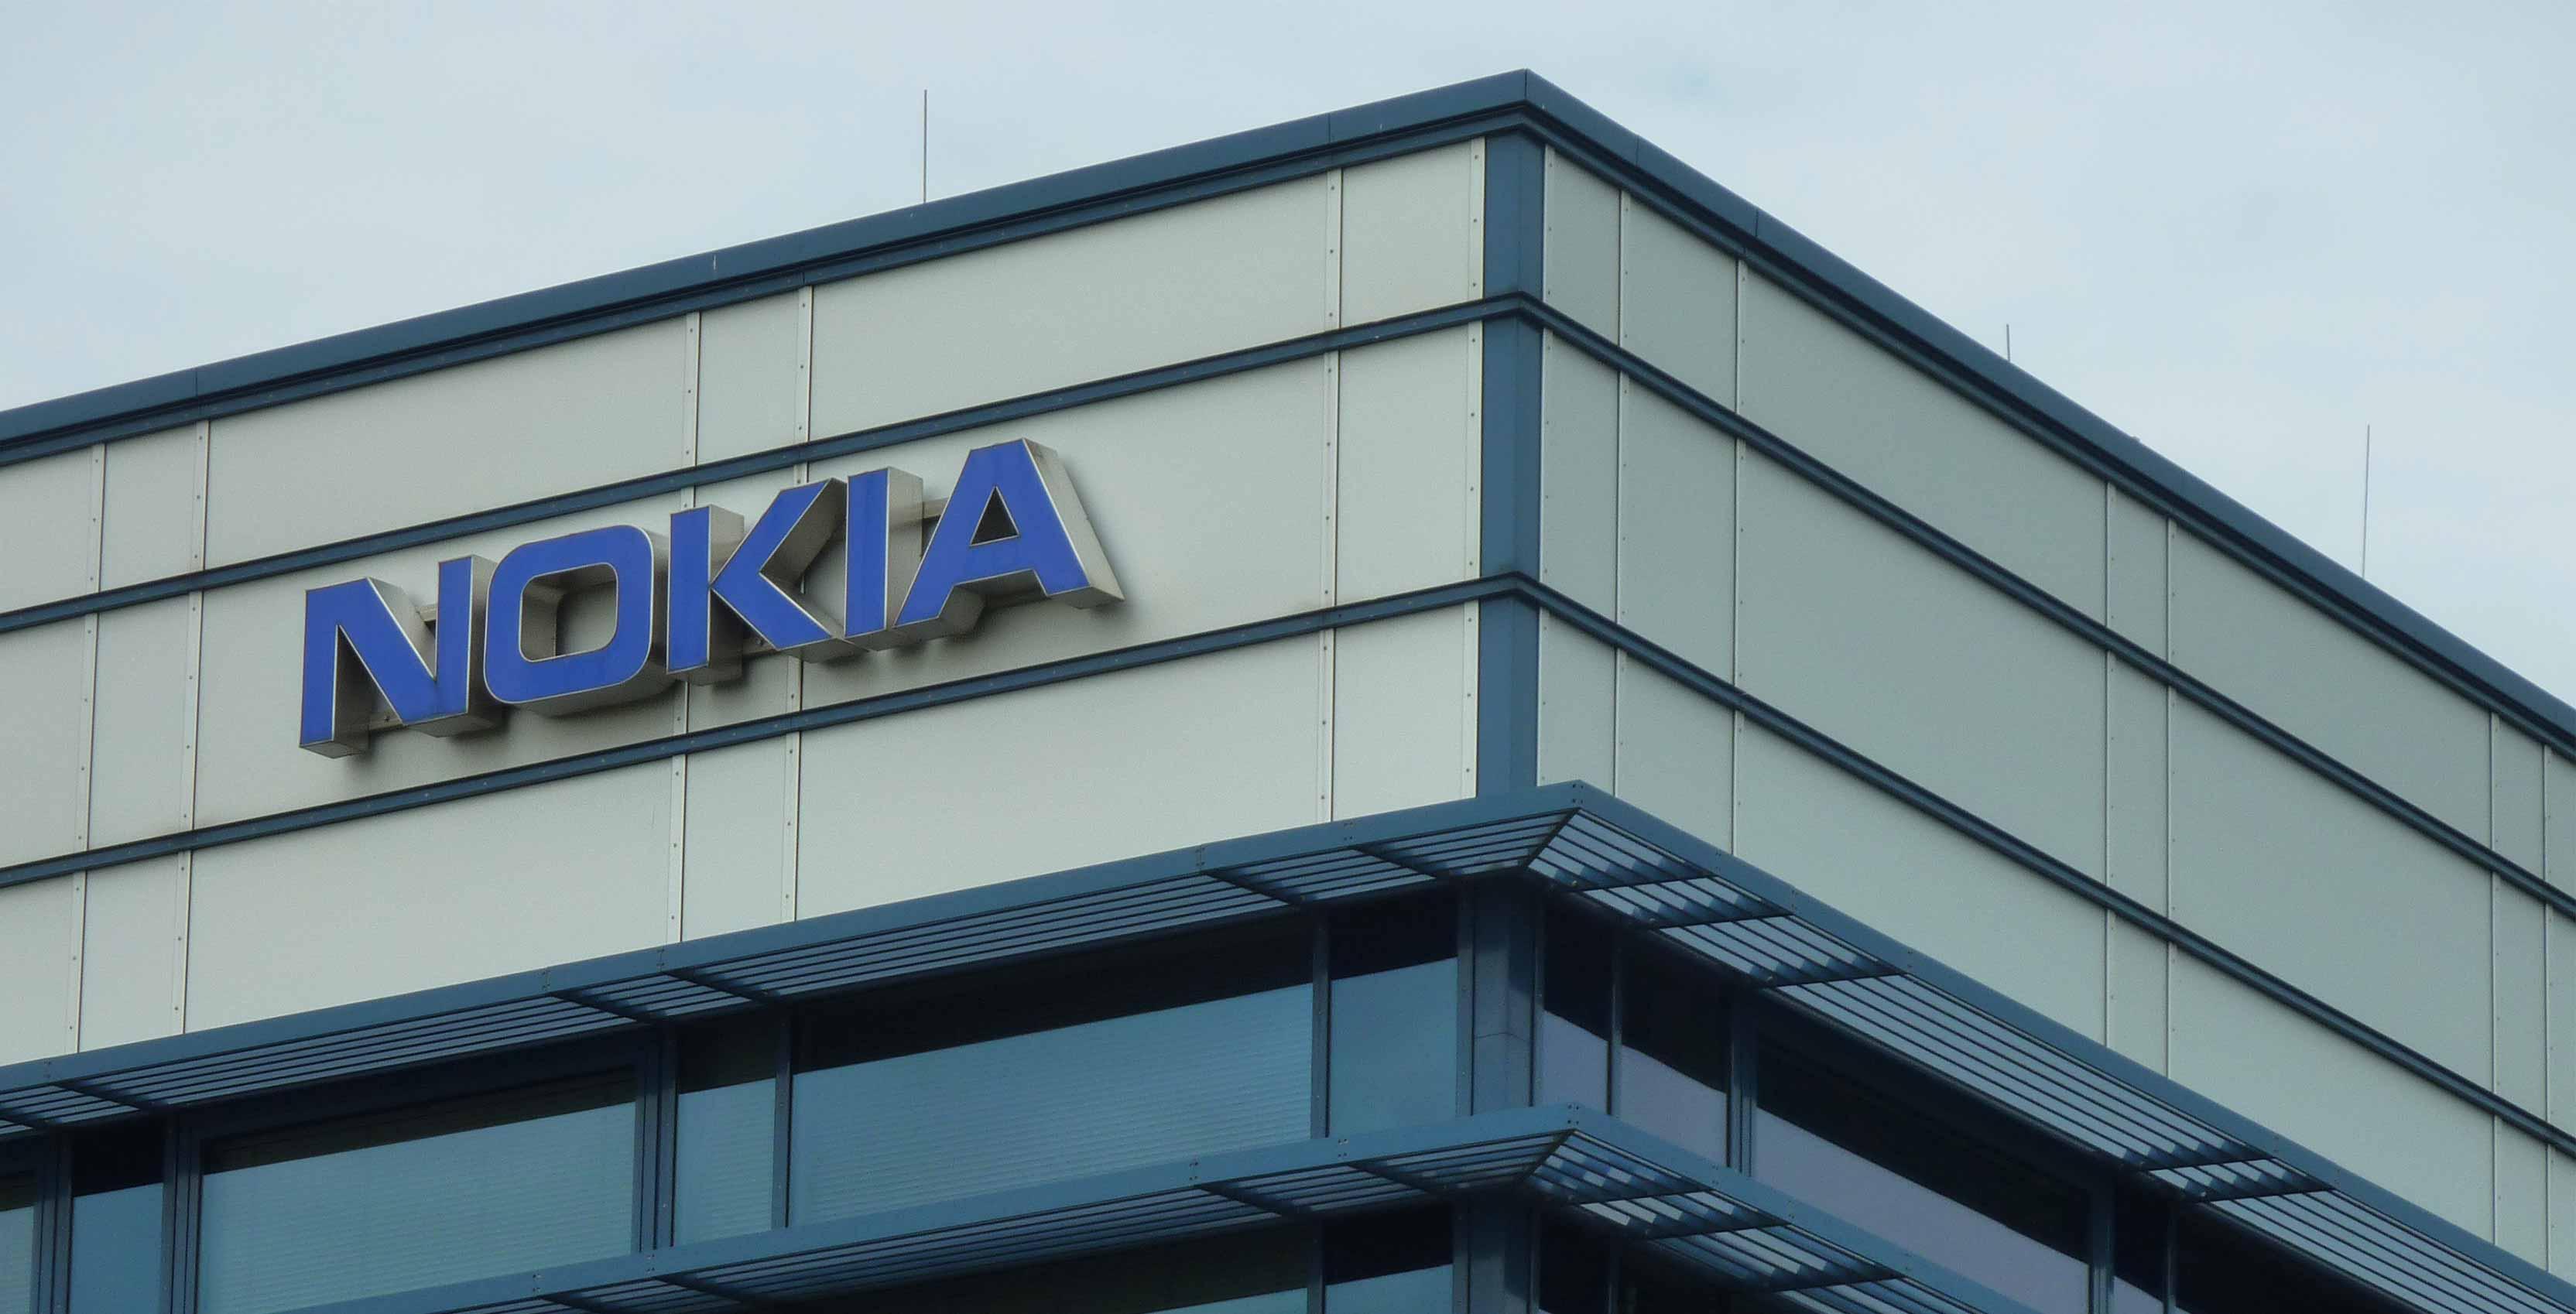 nokia sign headquarters - hmd global oy